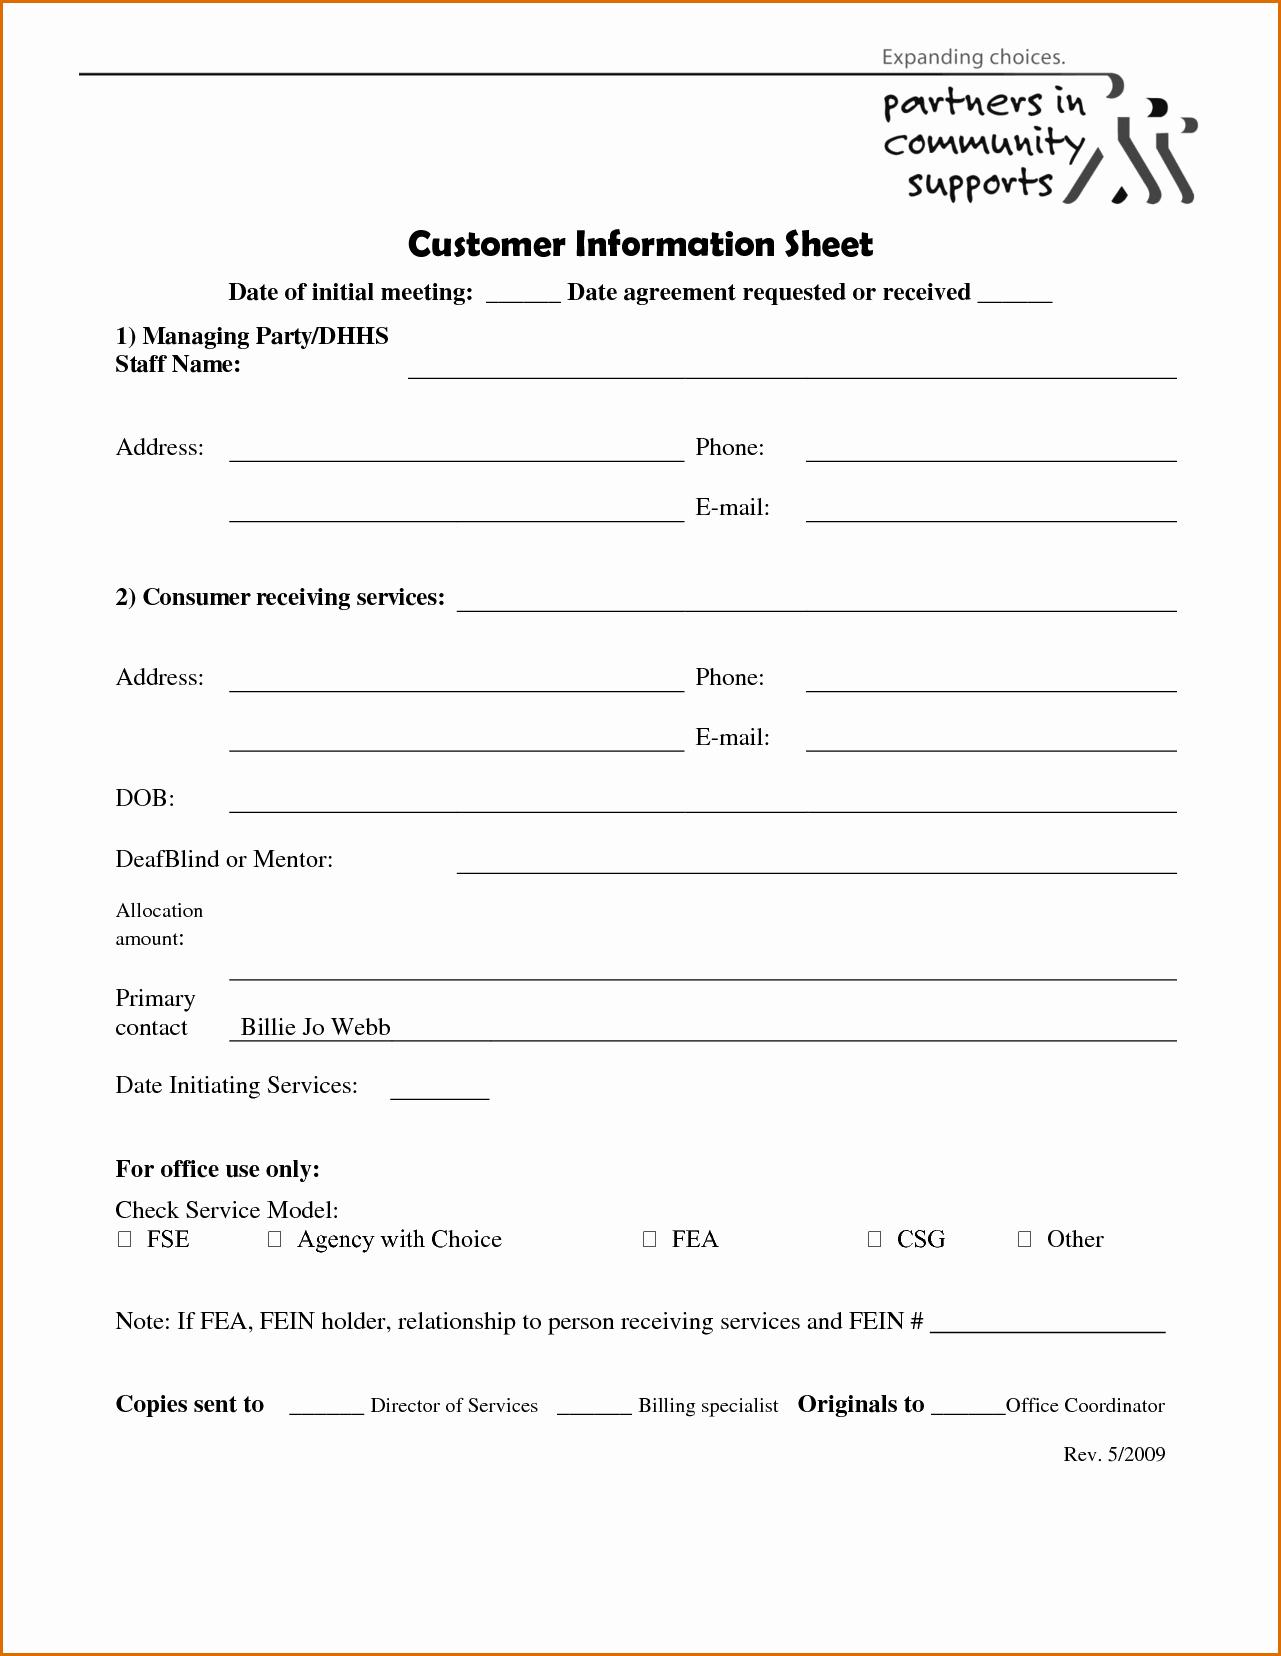 5 Client Information Sheet